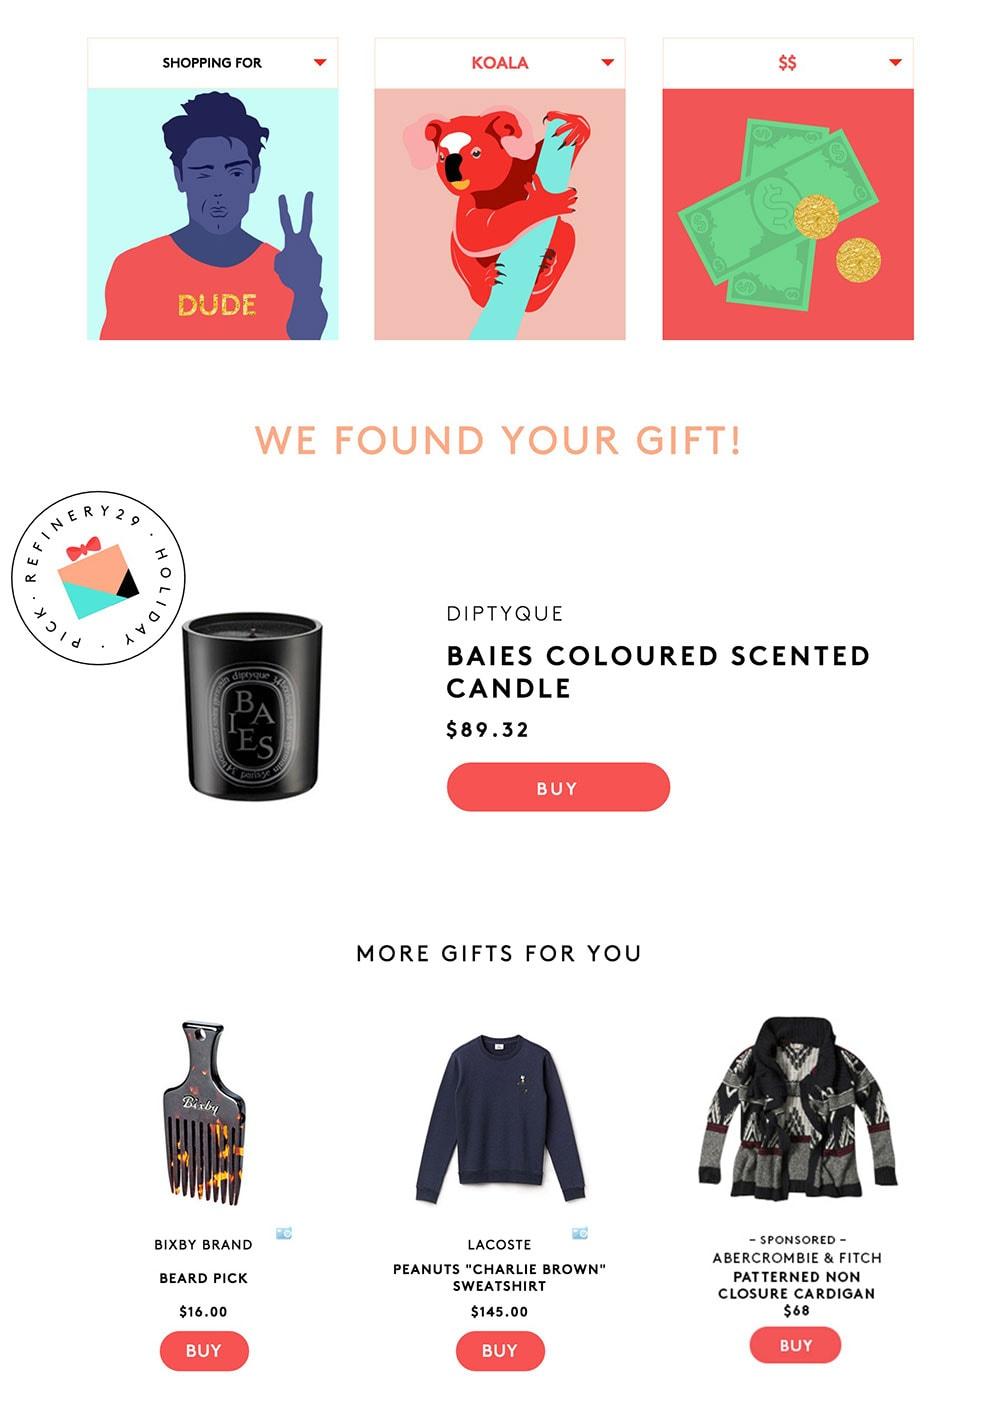 Gift curator test run on fiancee